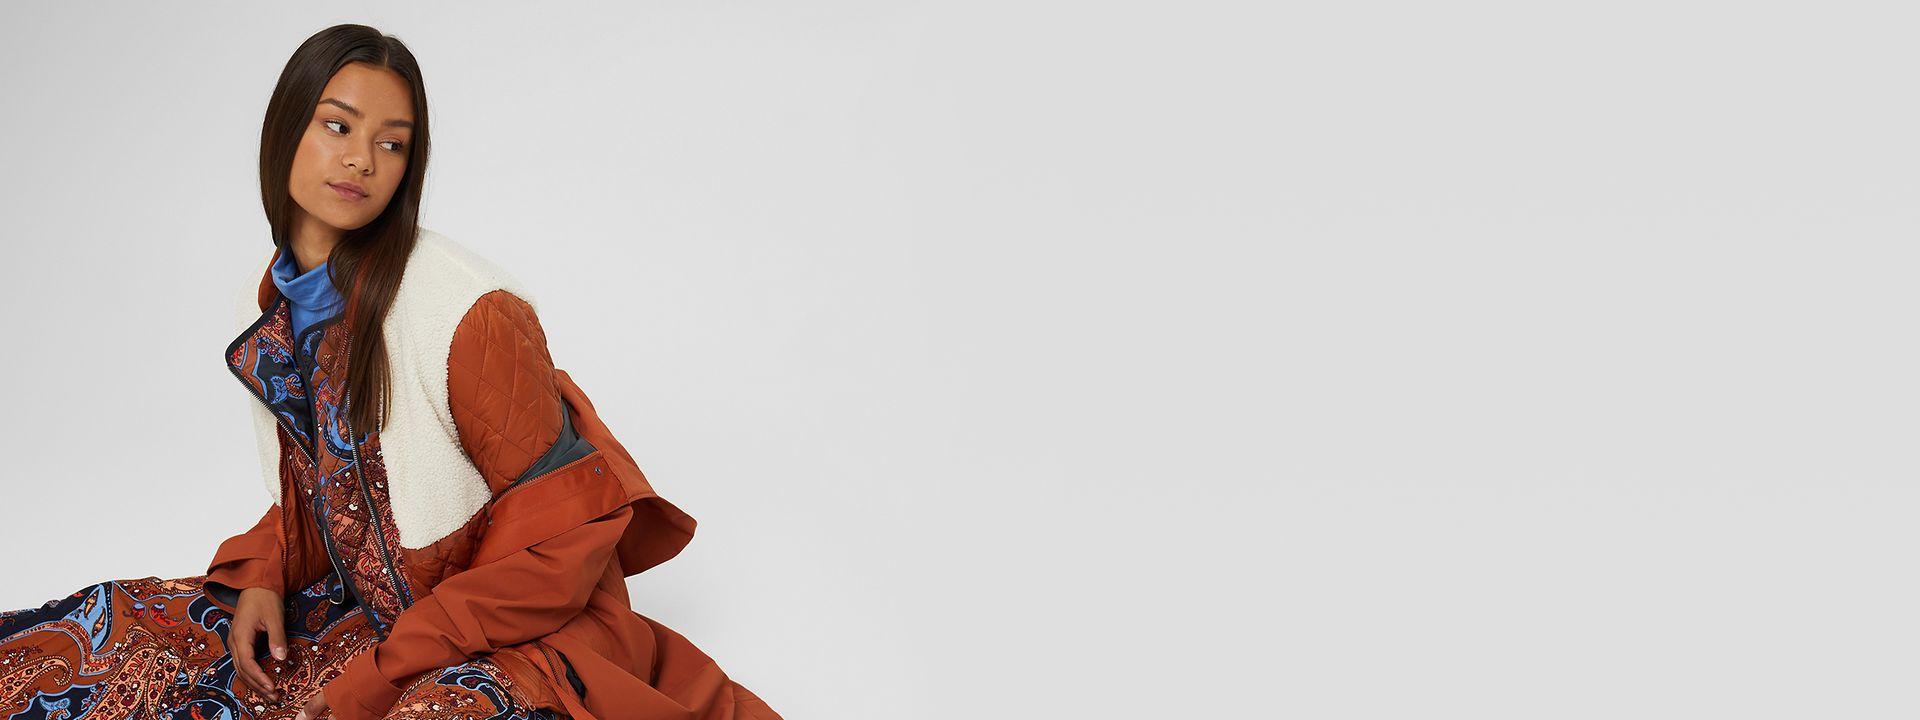 372021 - women - startpage - main banner - paisley - IMG